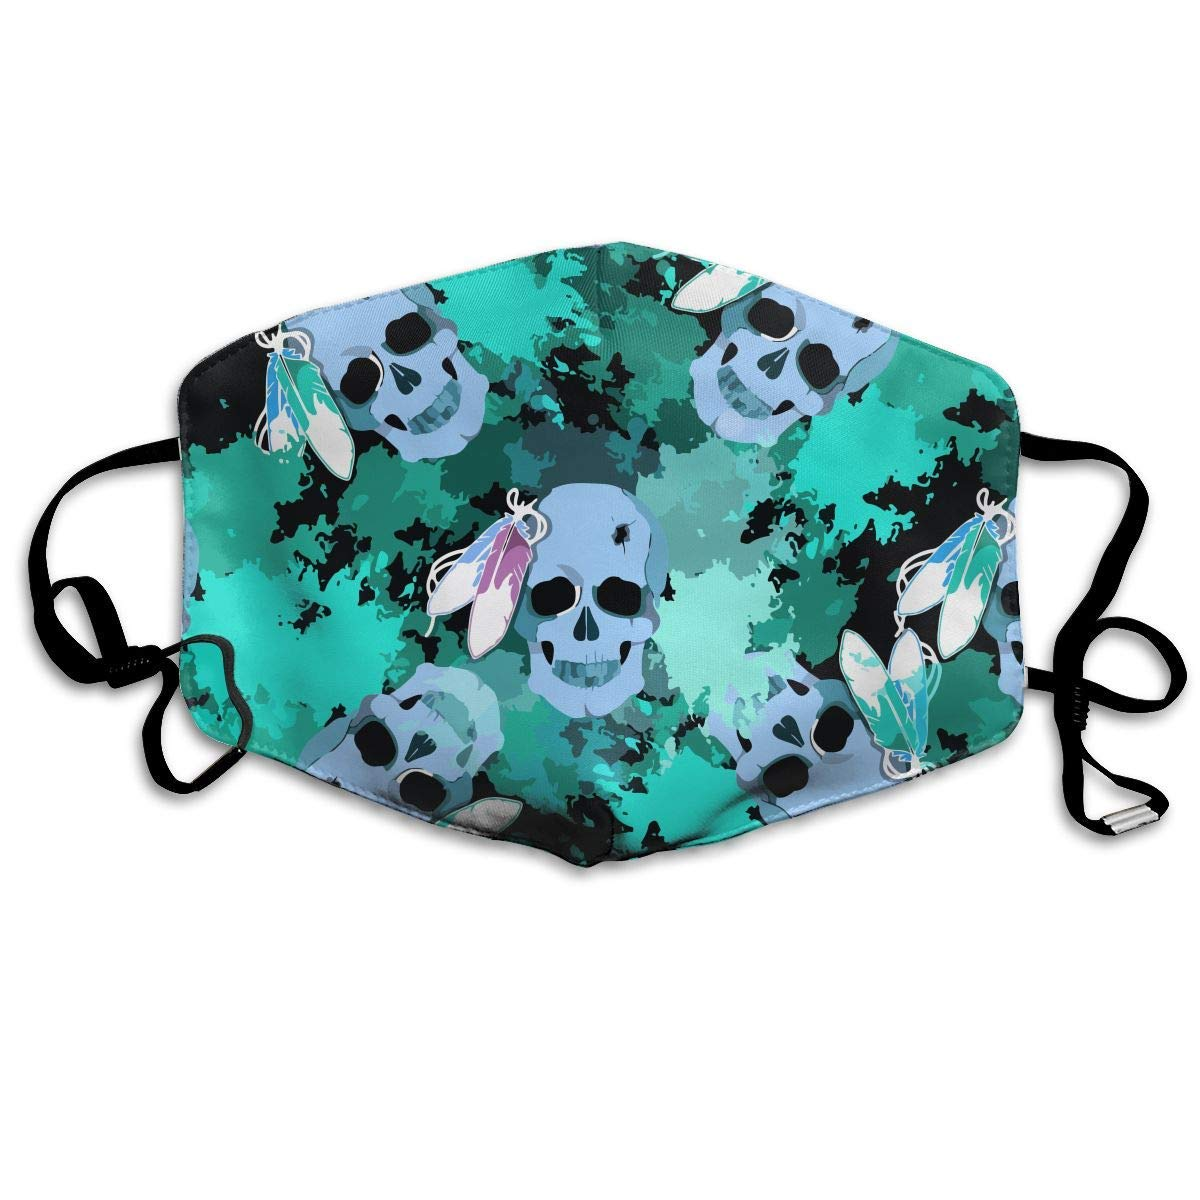 Daawqee Máscara de Boca, Green Feather Skull Tribe Unisex Fashion Mascarilla Washable Safety 100% Polyester Comfortable Breathable Health Half Face Masks